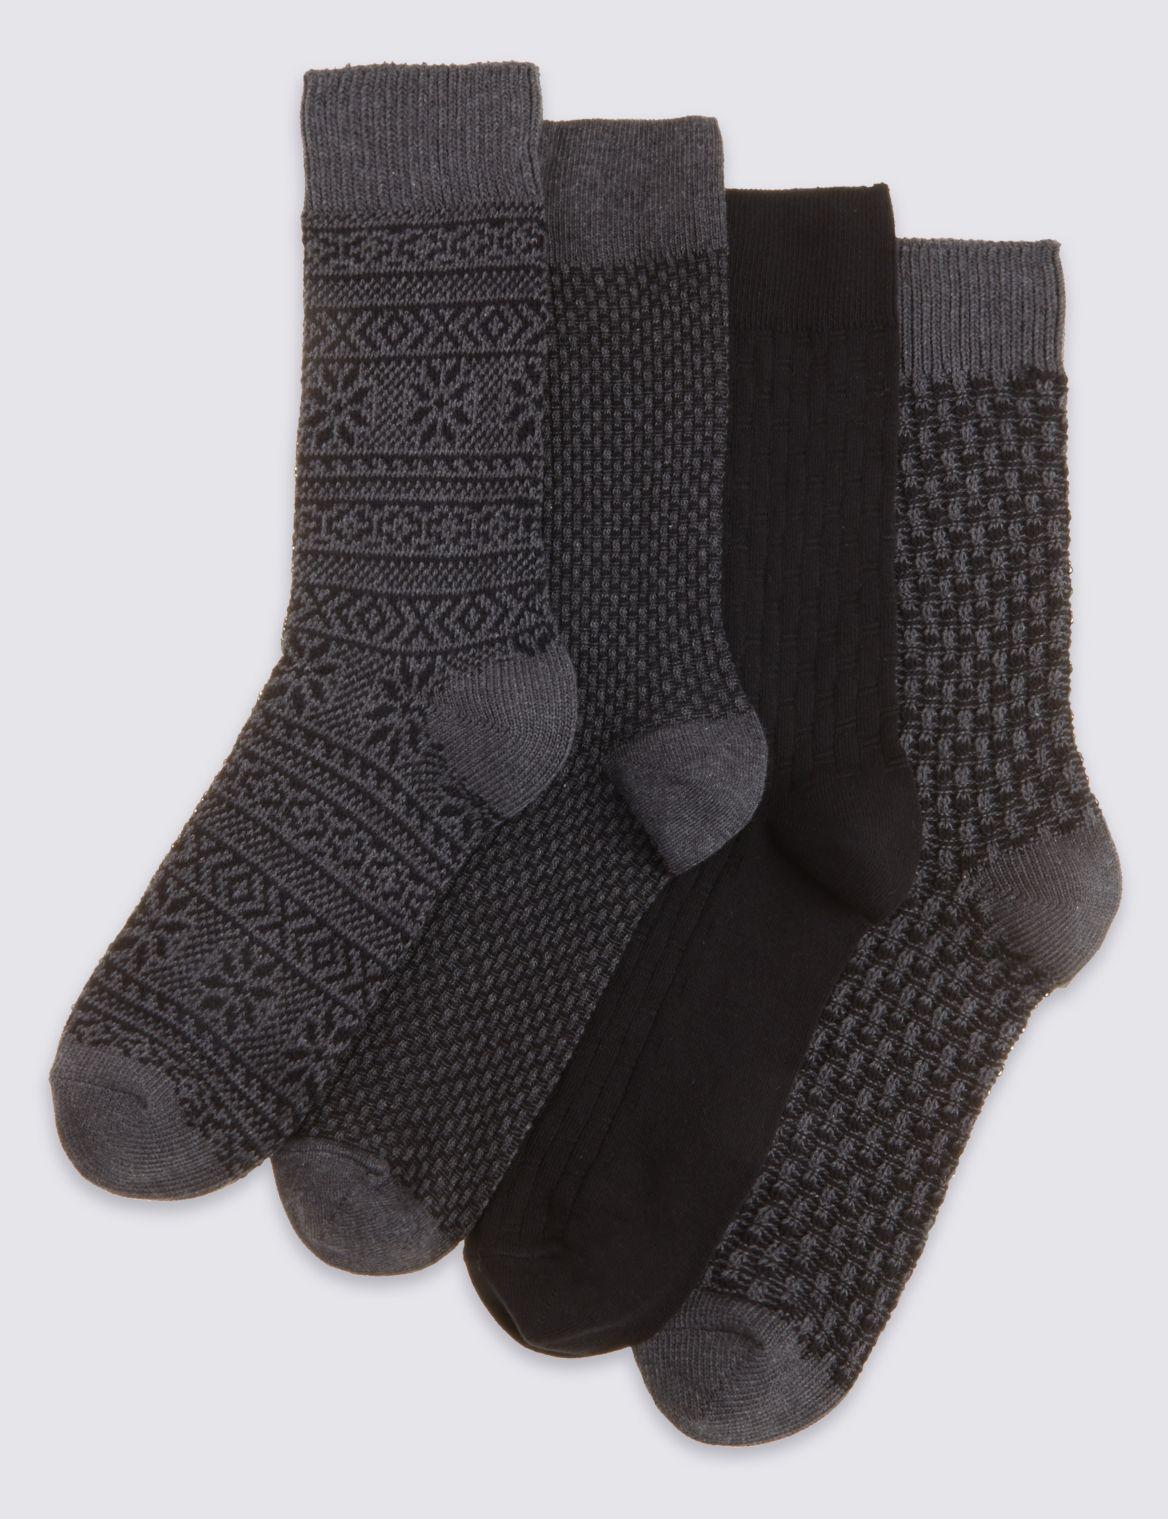 4 Pairs of Freshfeet™ Cotton Rich Socks grey mix